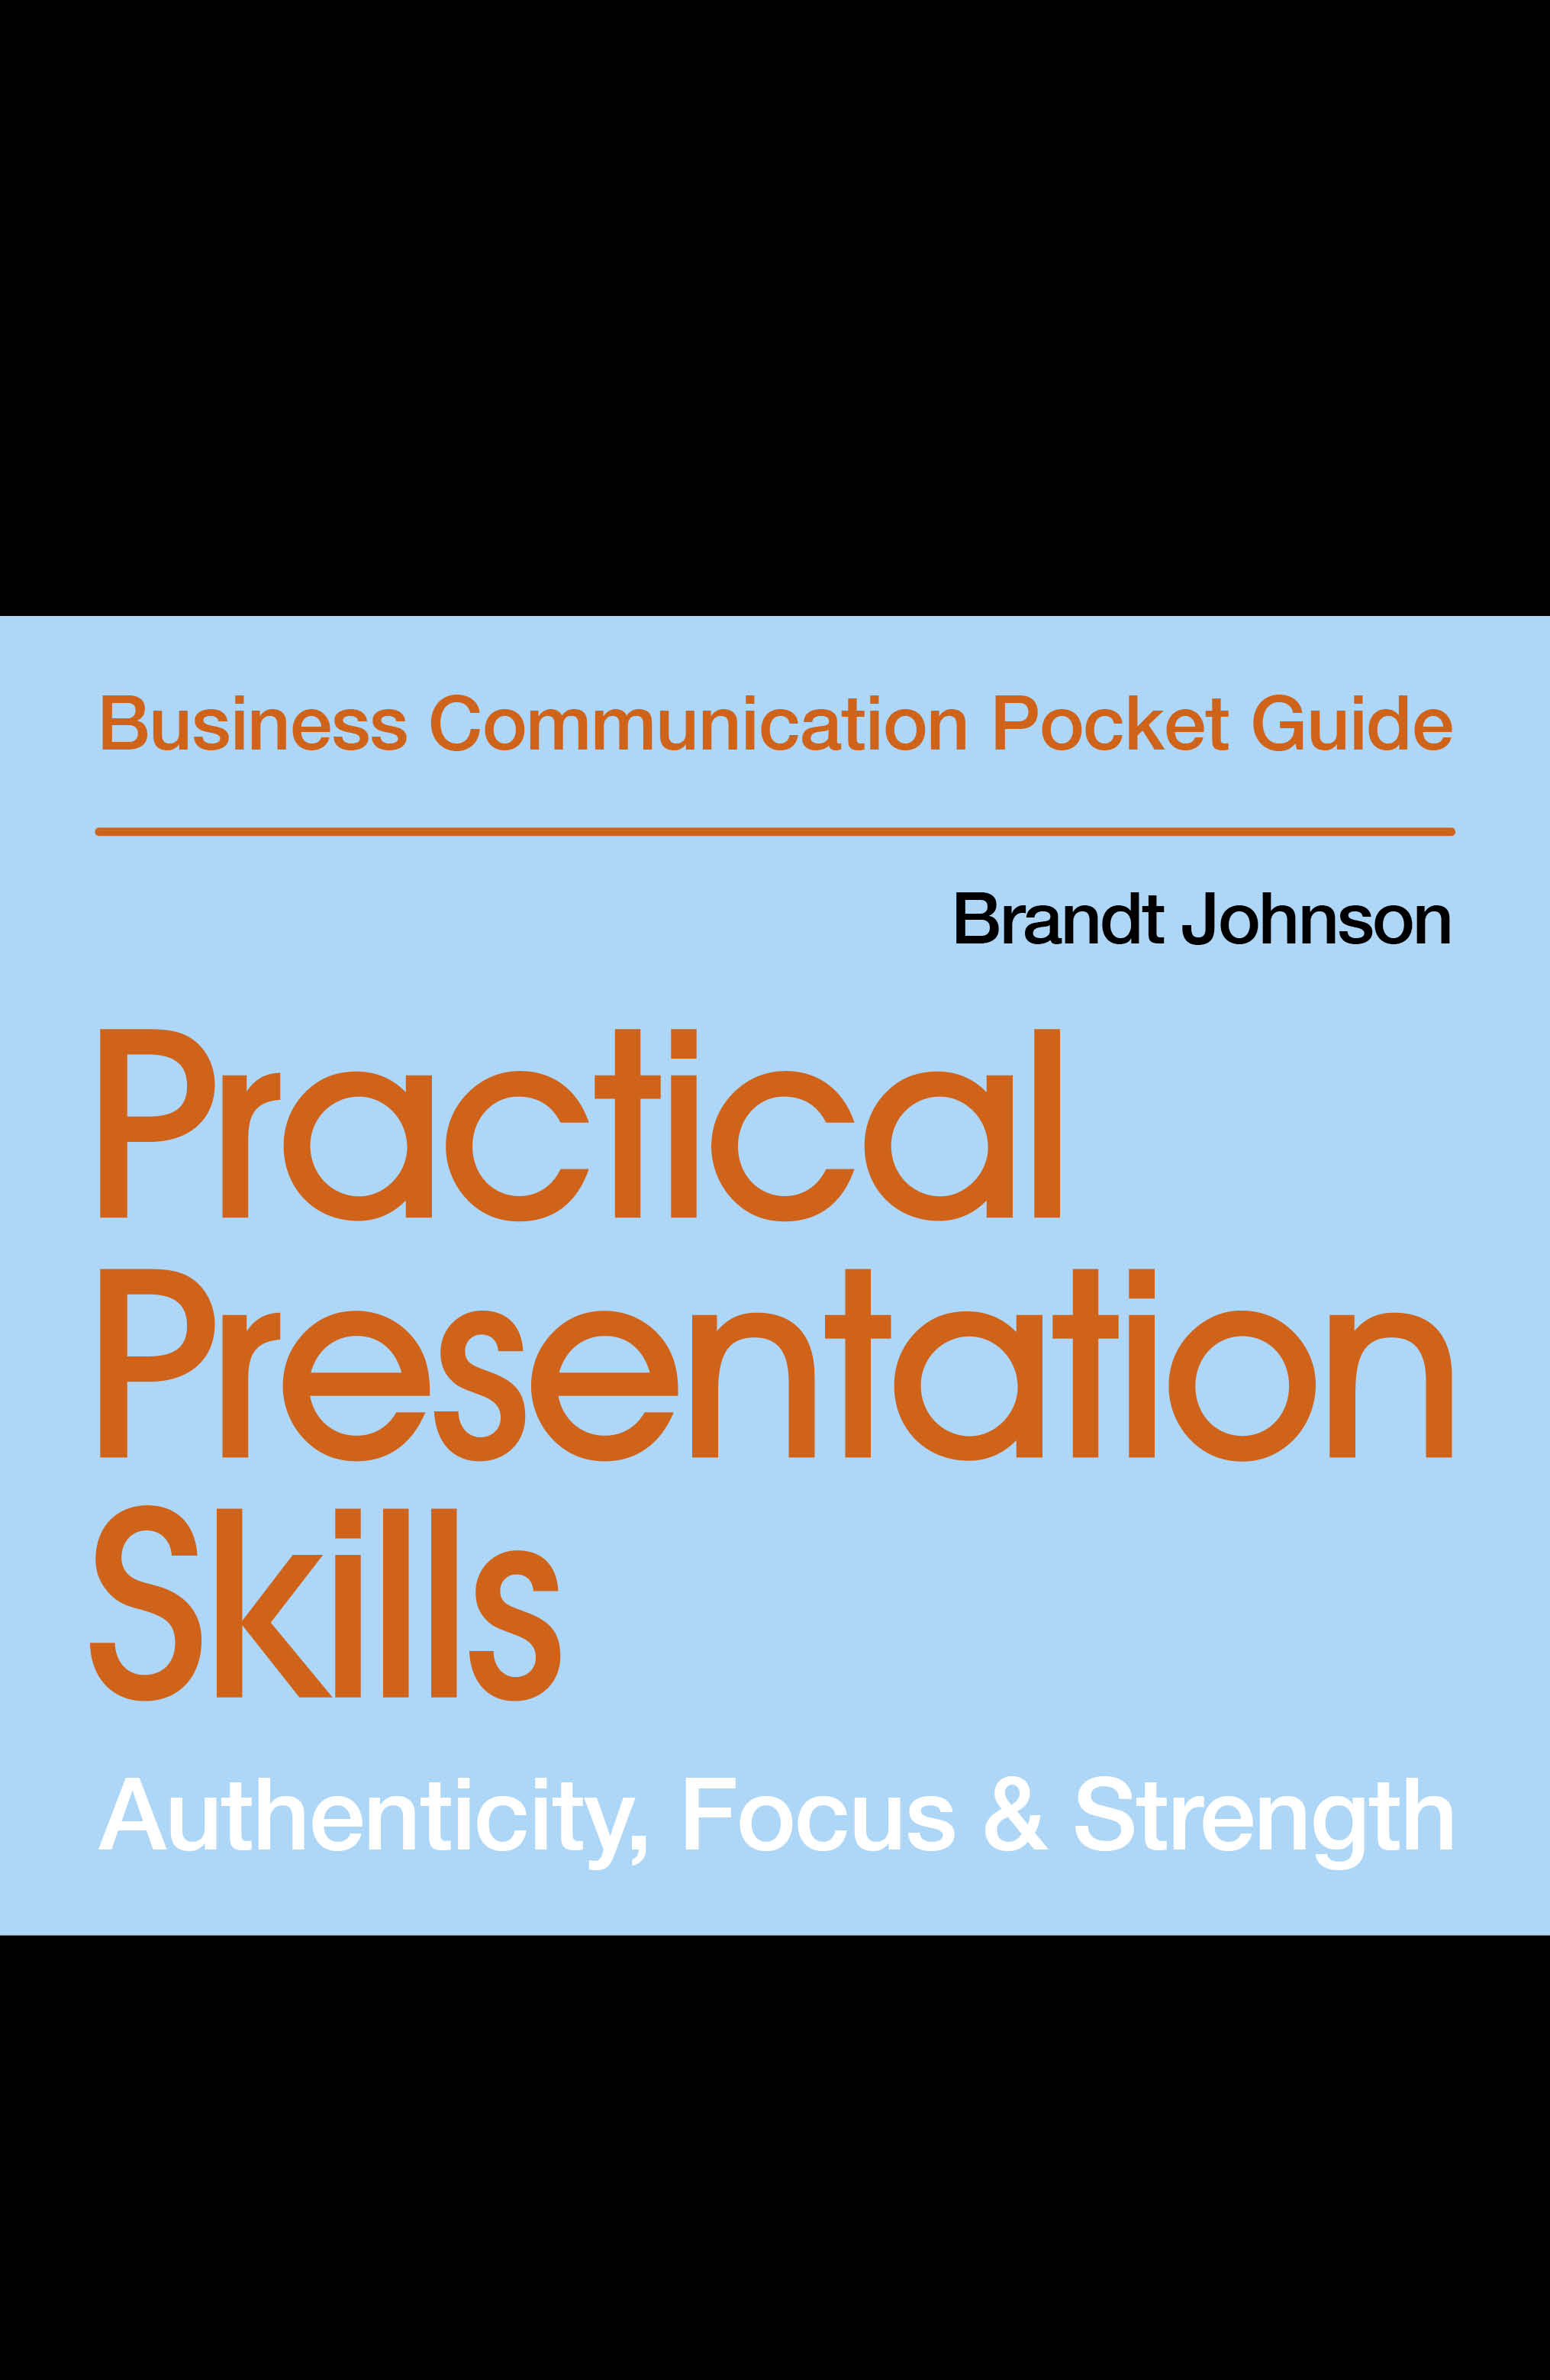 Business Communication Pocket Guide Series2.jpg